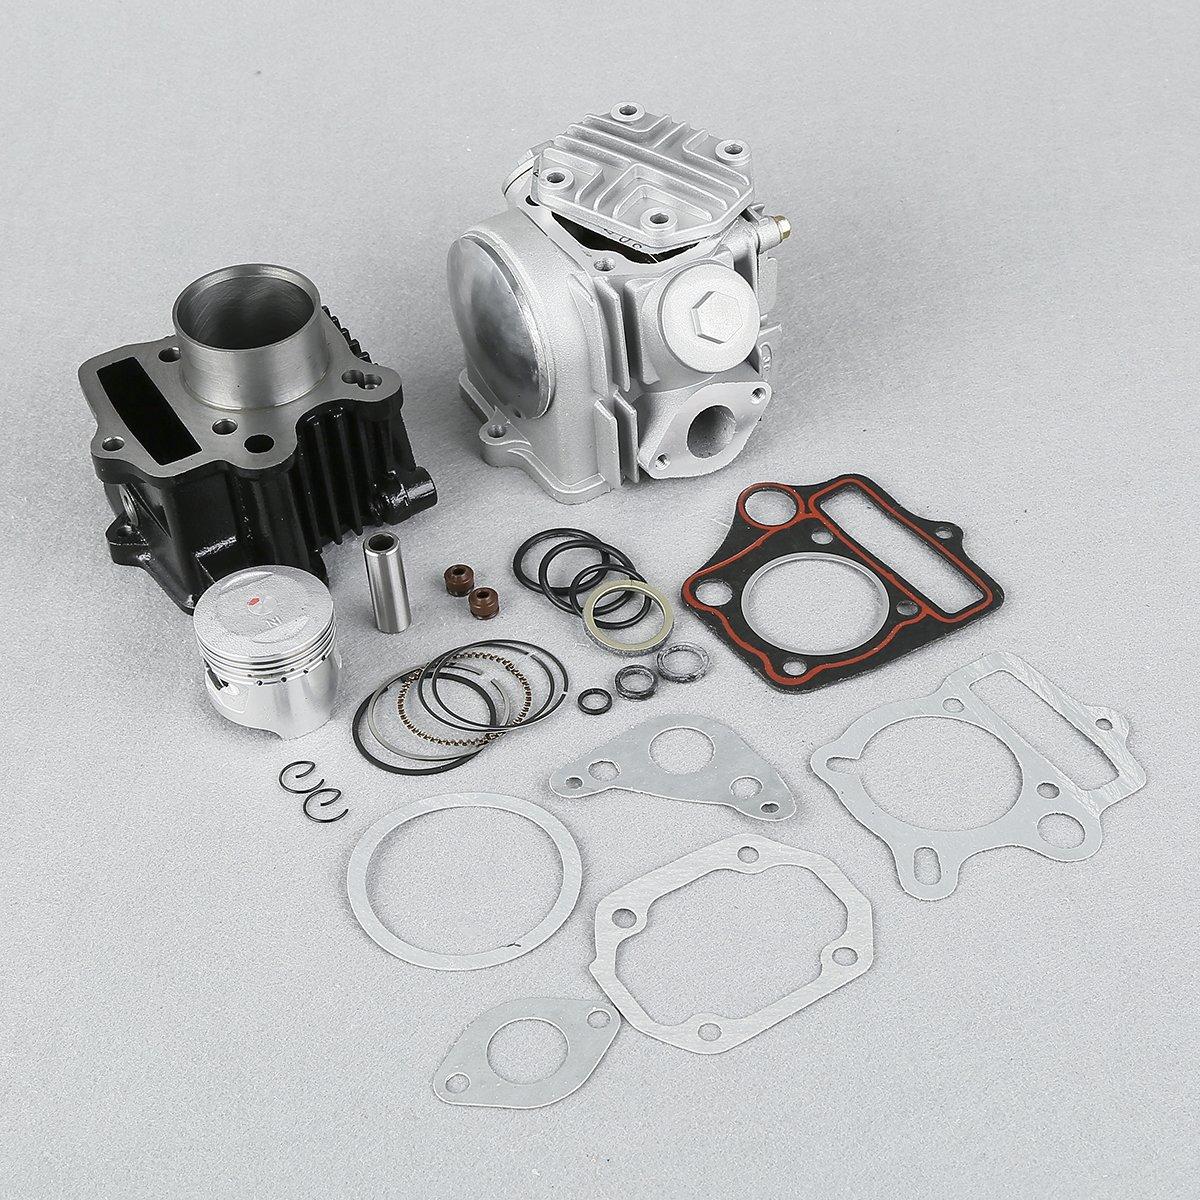 XFMT 70CC Engine Cylinder Rebuild Kit For Honda ATC70 CRF70 CT70 TRX70 XR70 49.5CM3